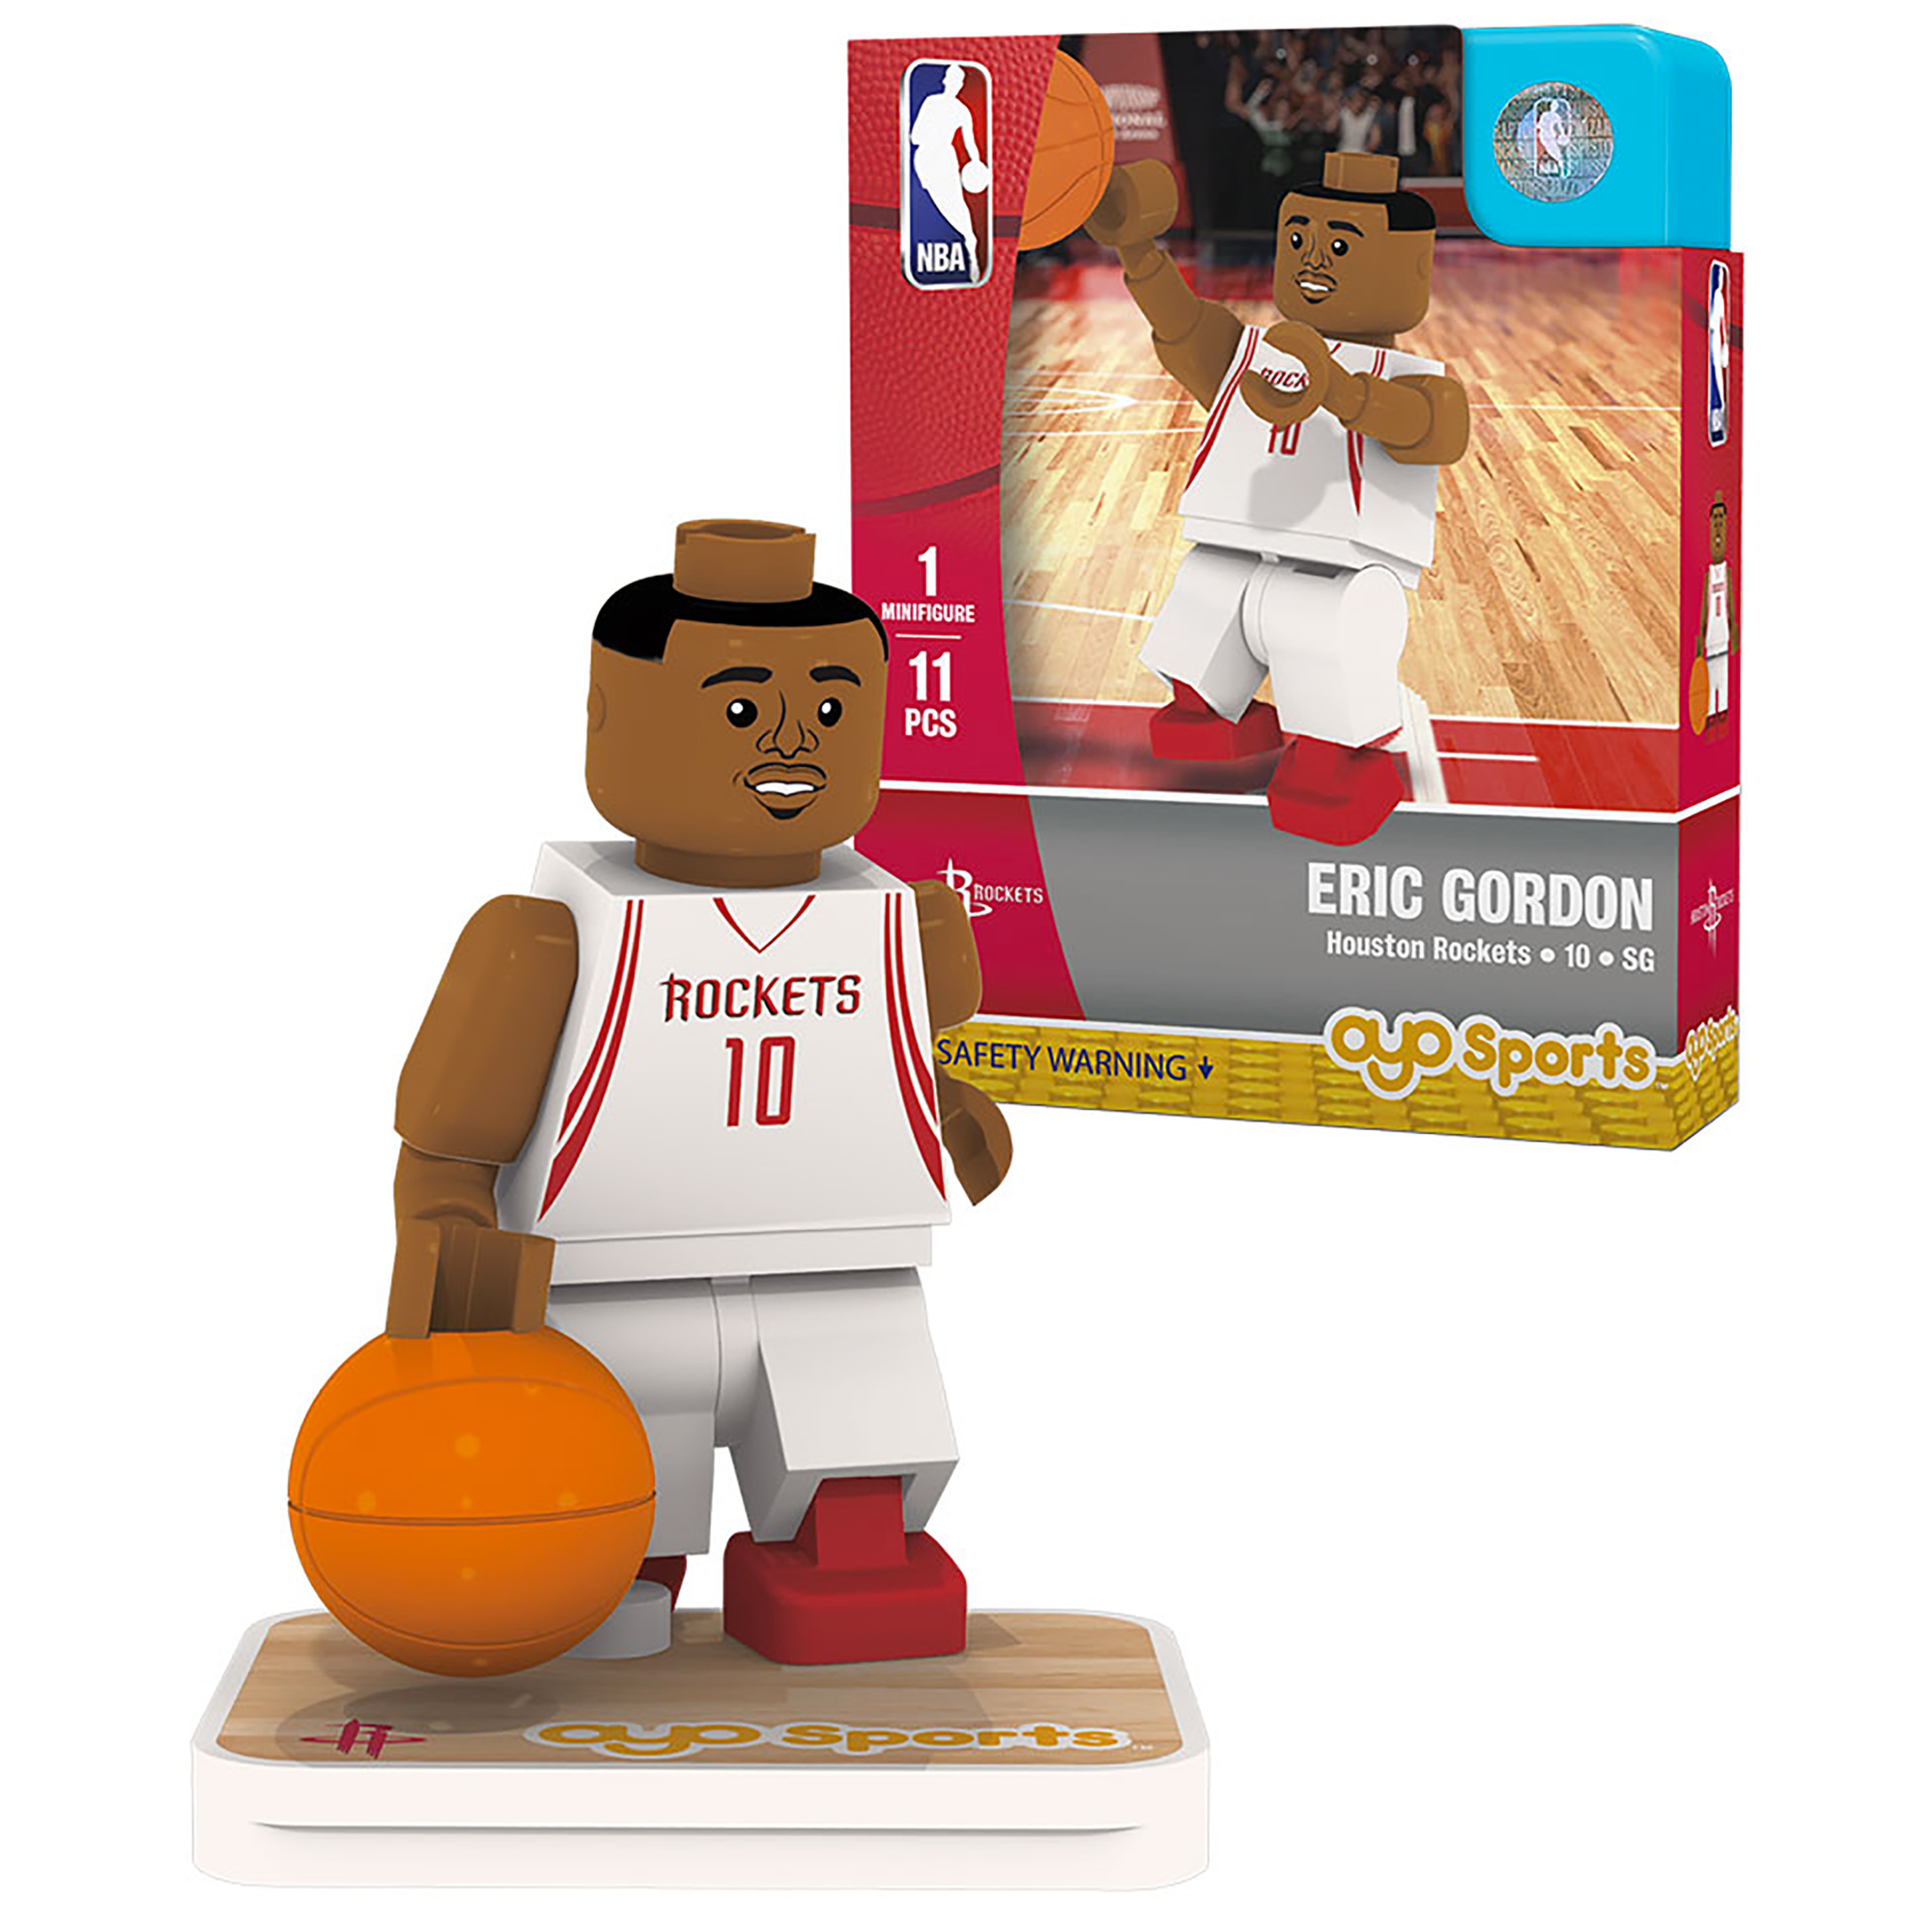 Eric Gordon Houston Rockets OYO Sports Player Figurine - No Size